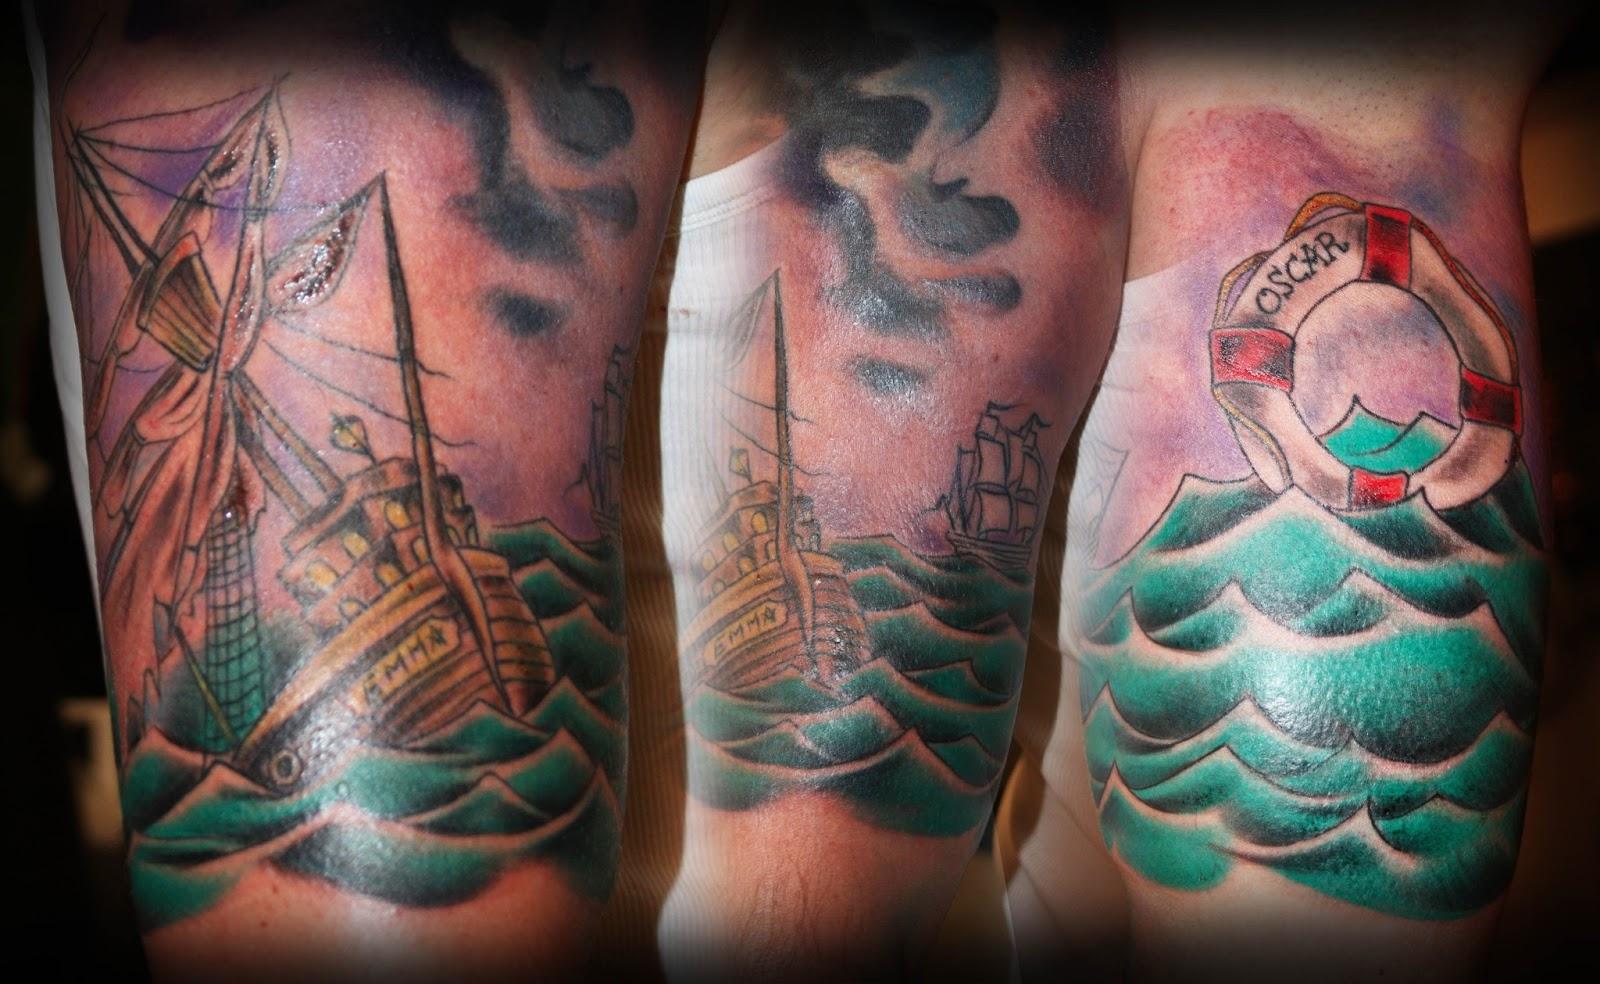 Little bird tattoo in progress troll sinking ship tattoo for Sinking ship tattoo